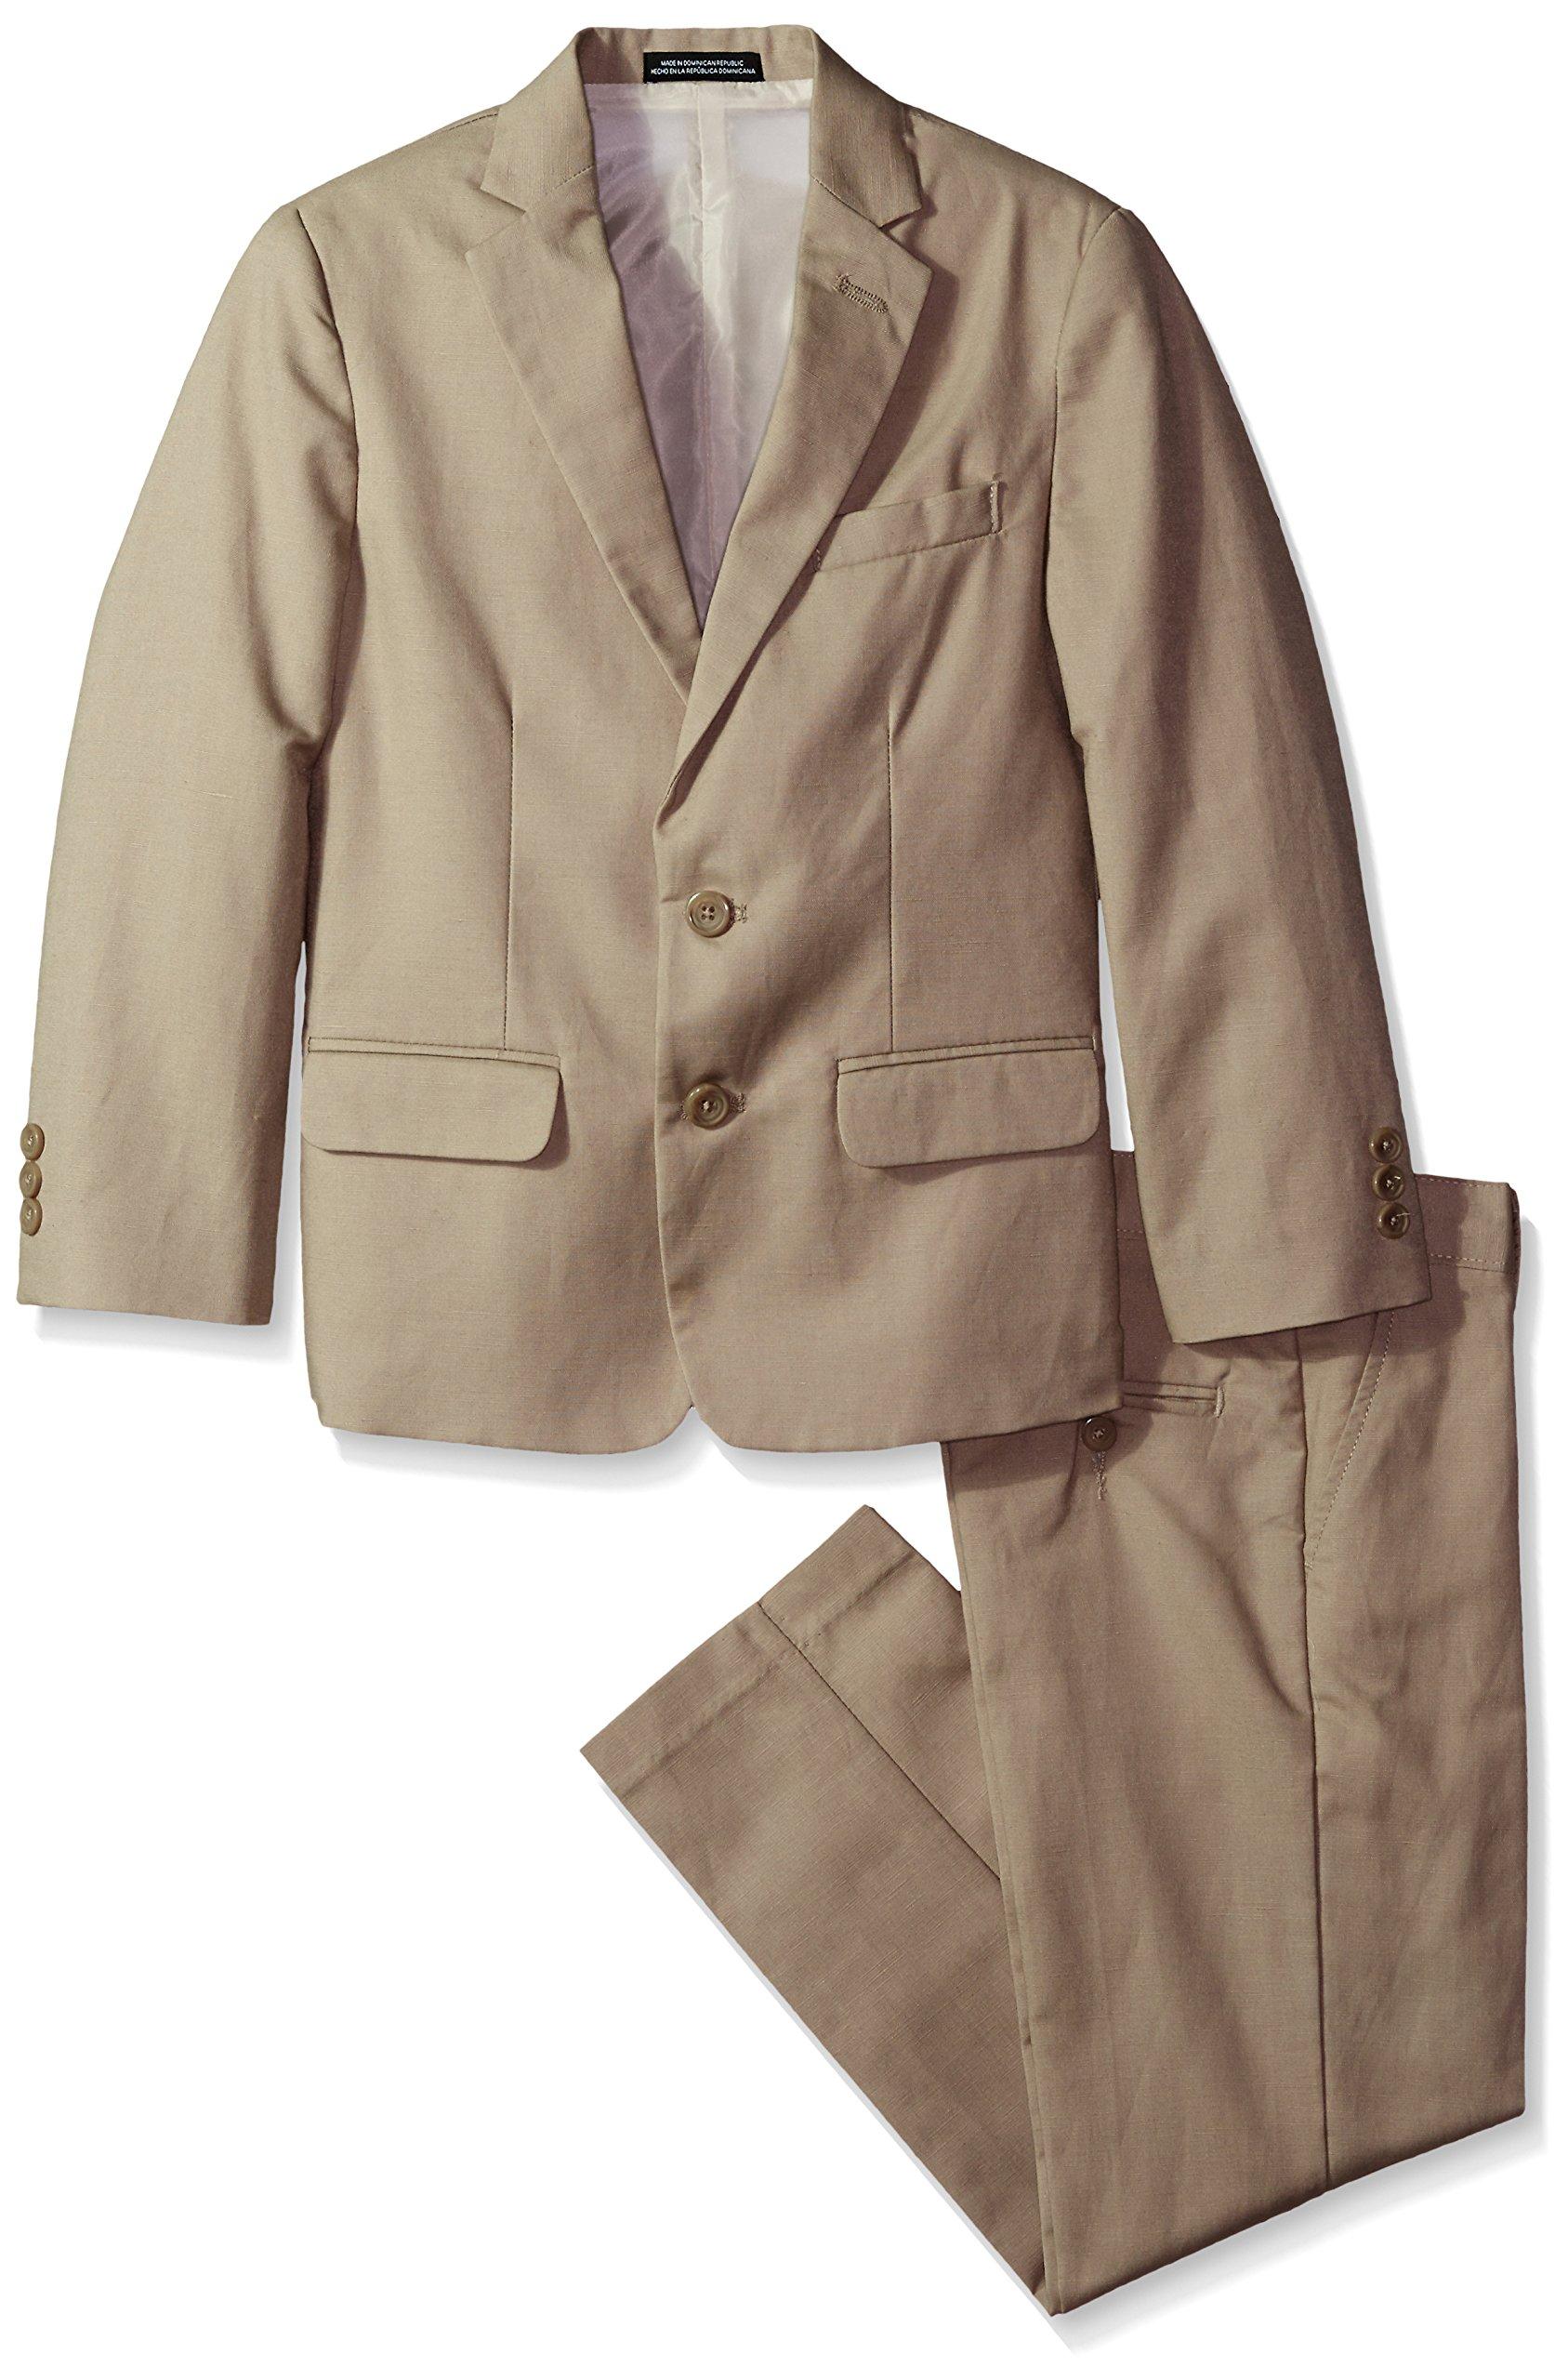 Van Heusen Big Boys' Linen Suit, Khaki, 14